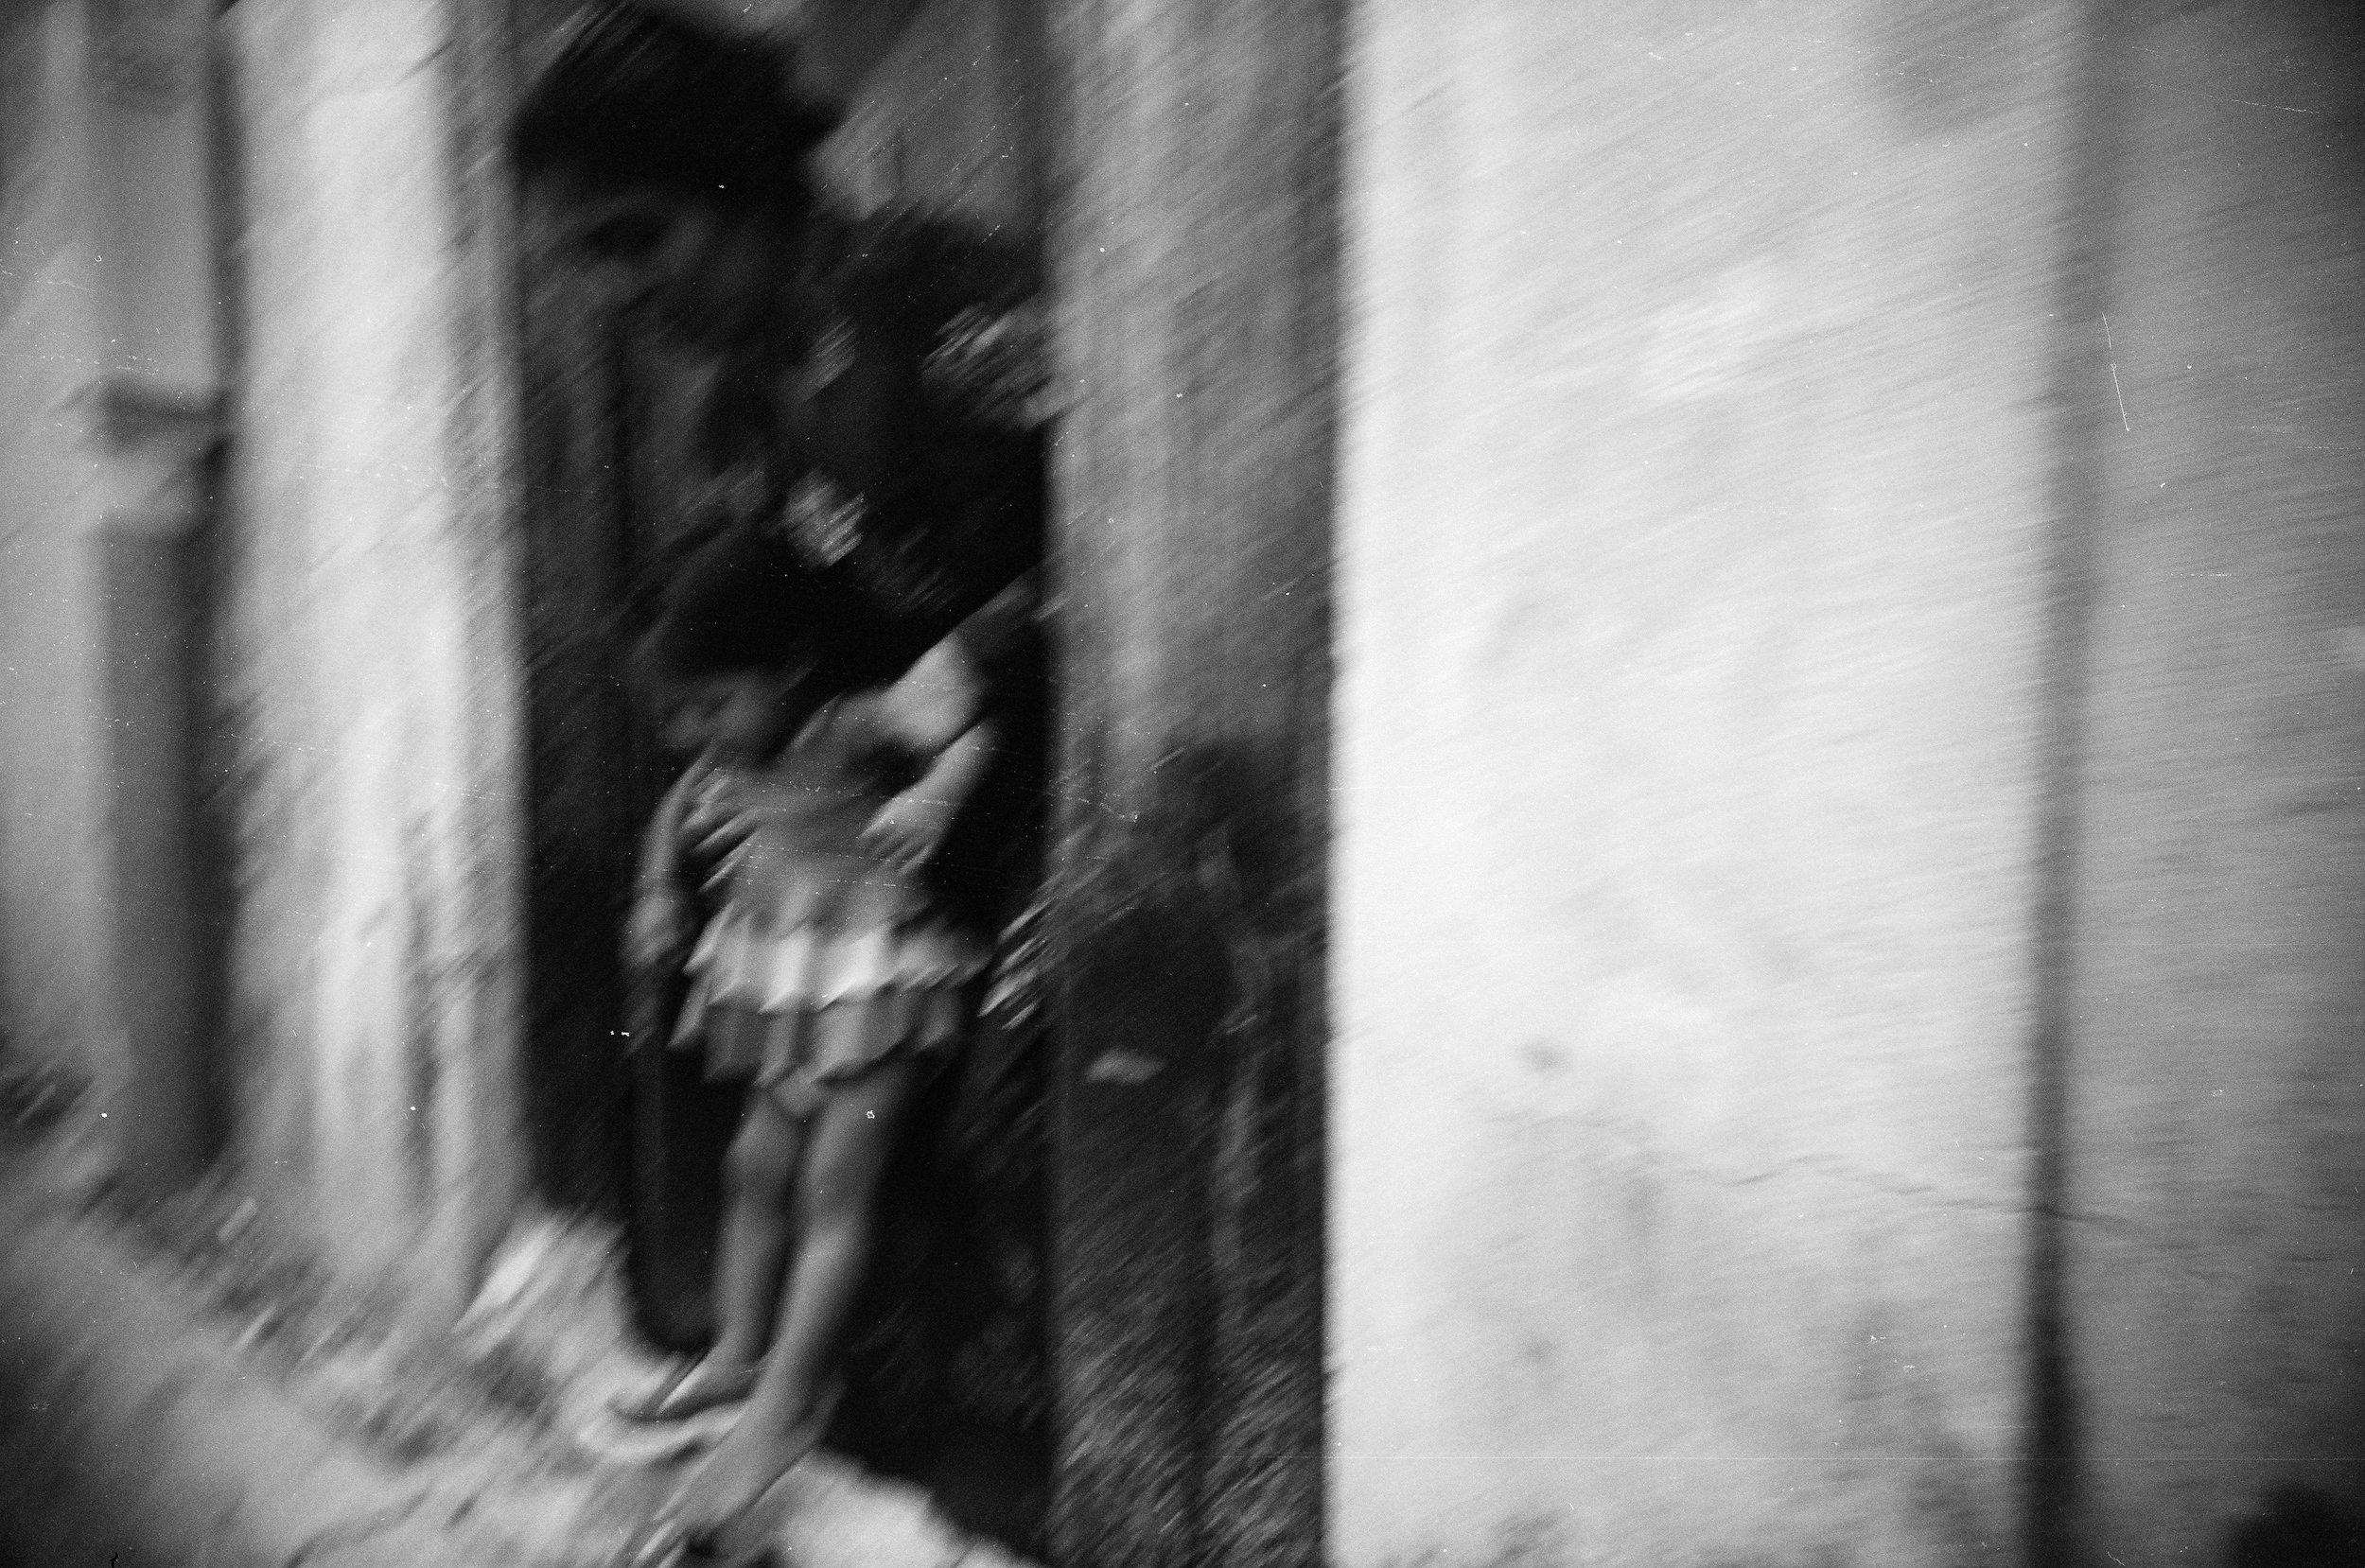 01 - Vivitar Ultrawide & Slim with Kodak BW400CN (2008) - Untitled (motheranddaughter).JPG